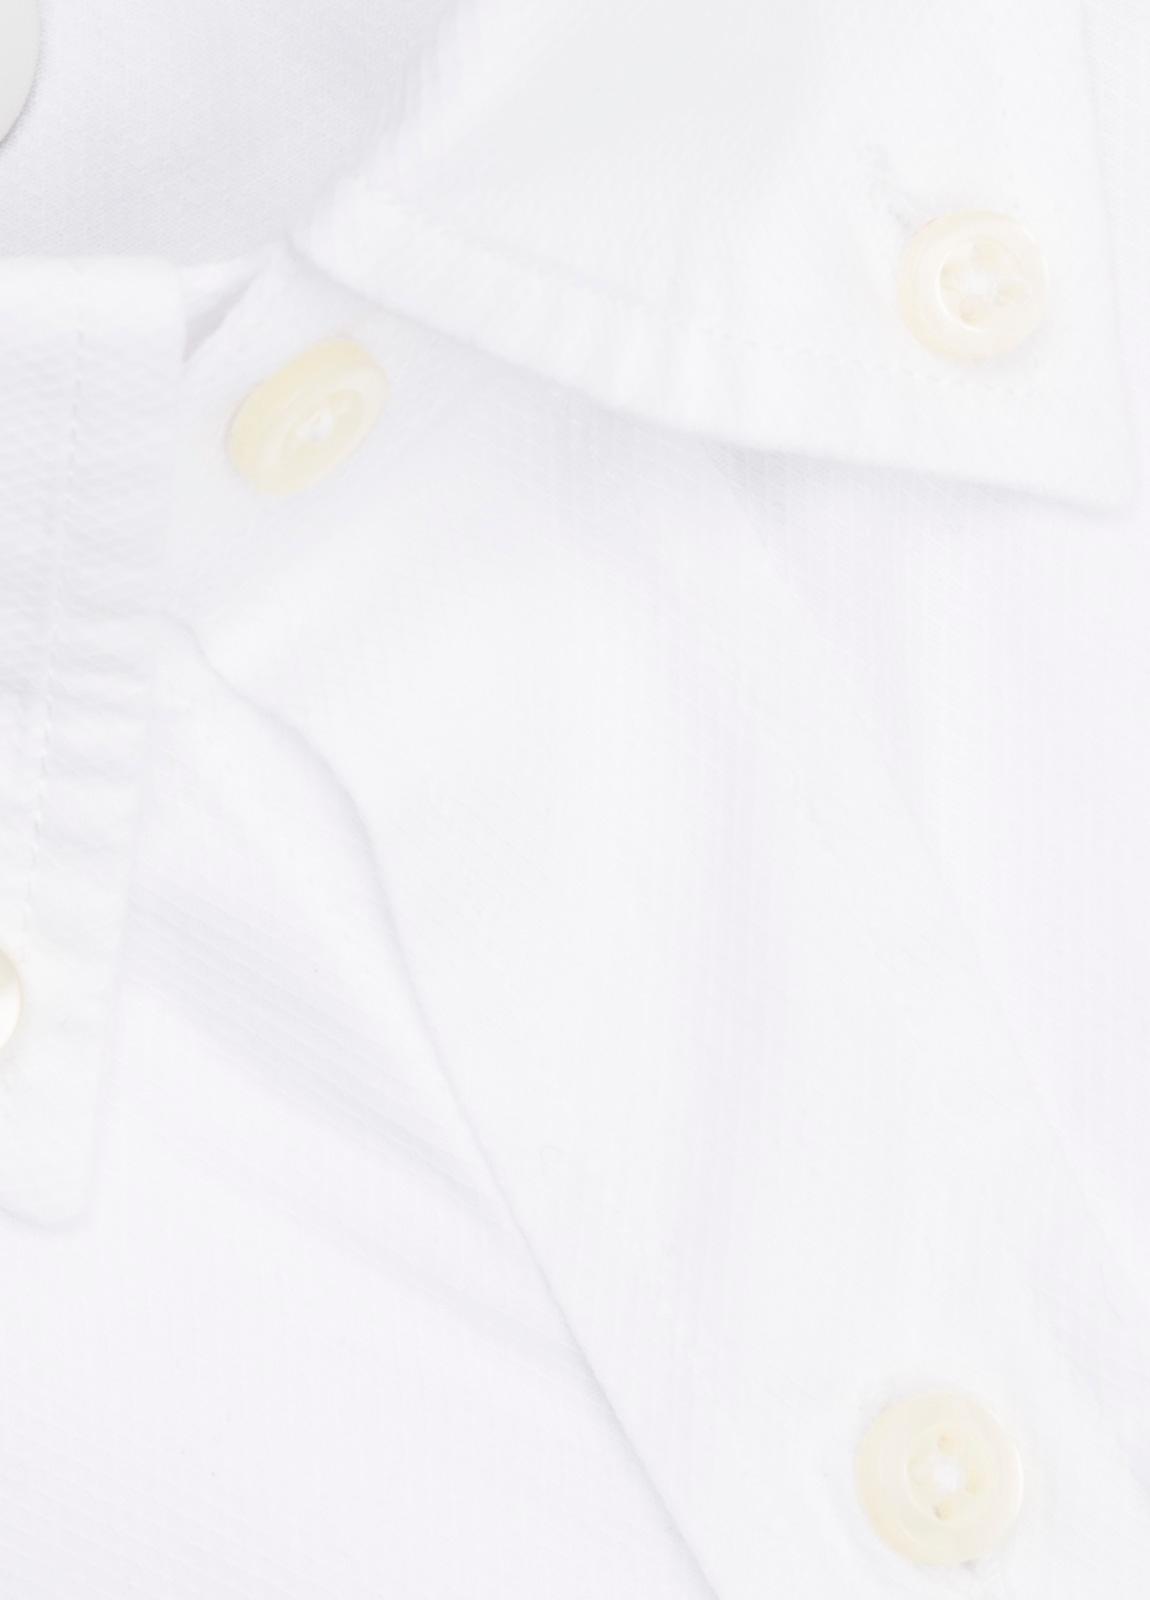 Camisa M/Corta sport FUREST COLECCIÓN Regular FIT blanco - Ítem1